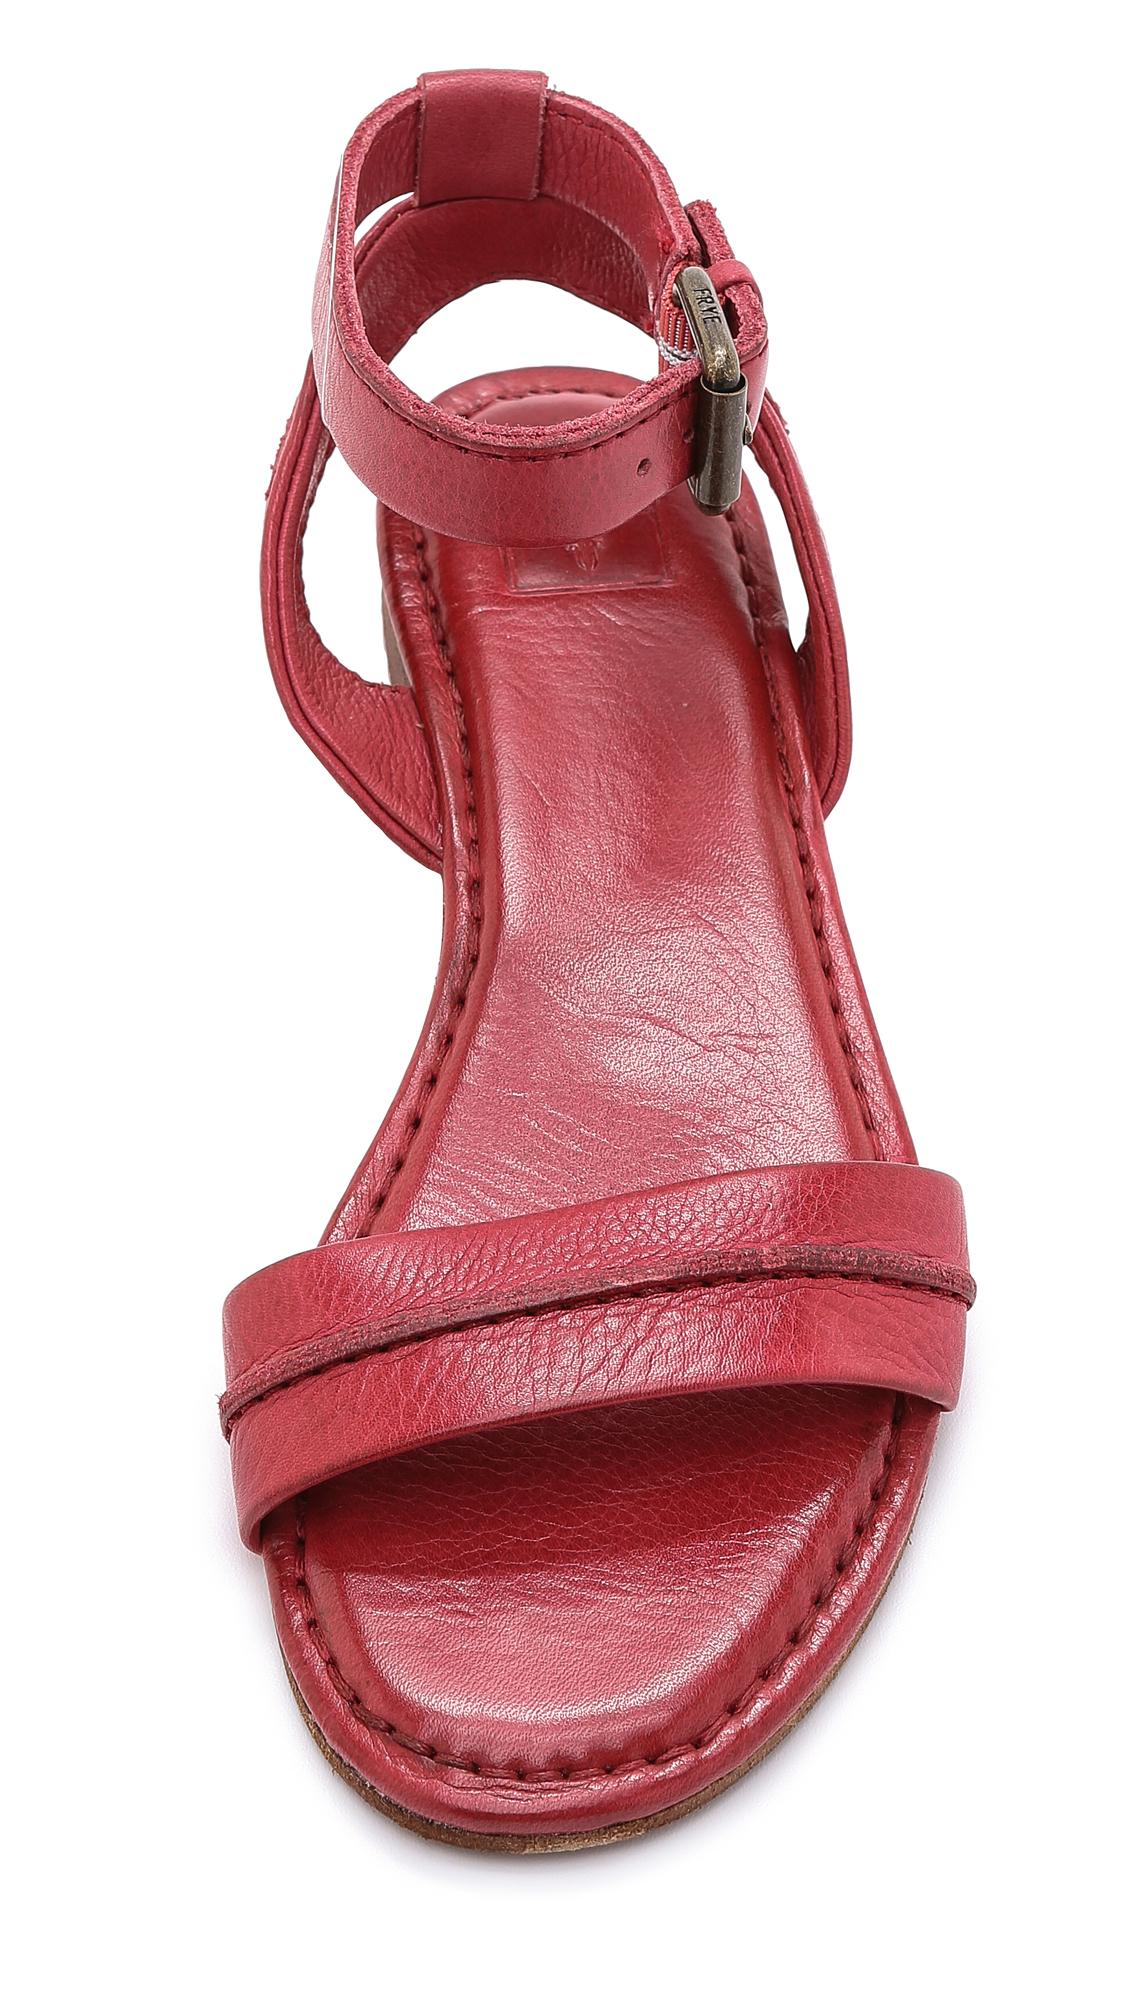 Papaya Shoes Australia